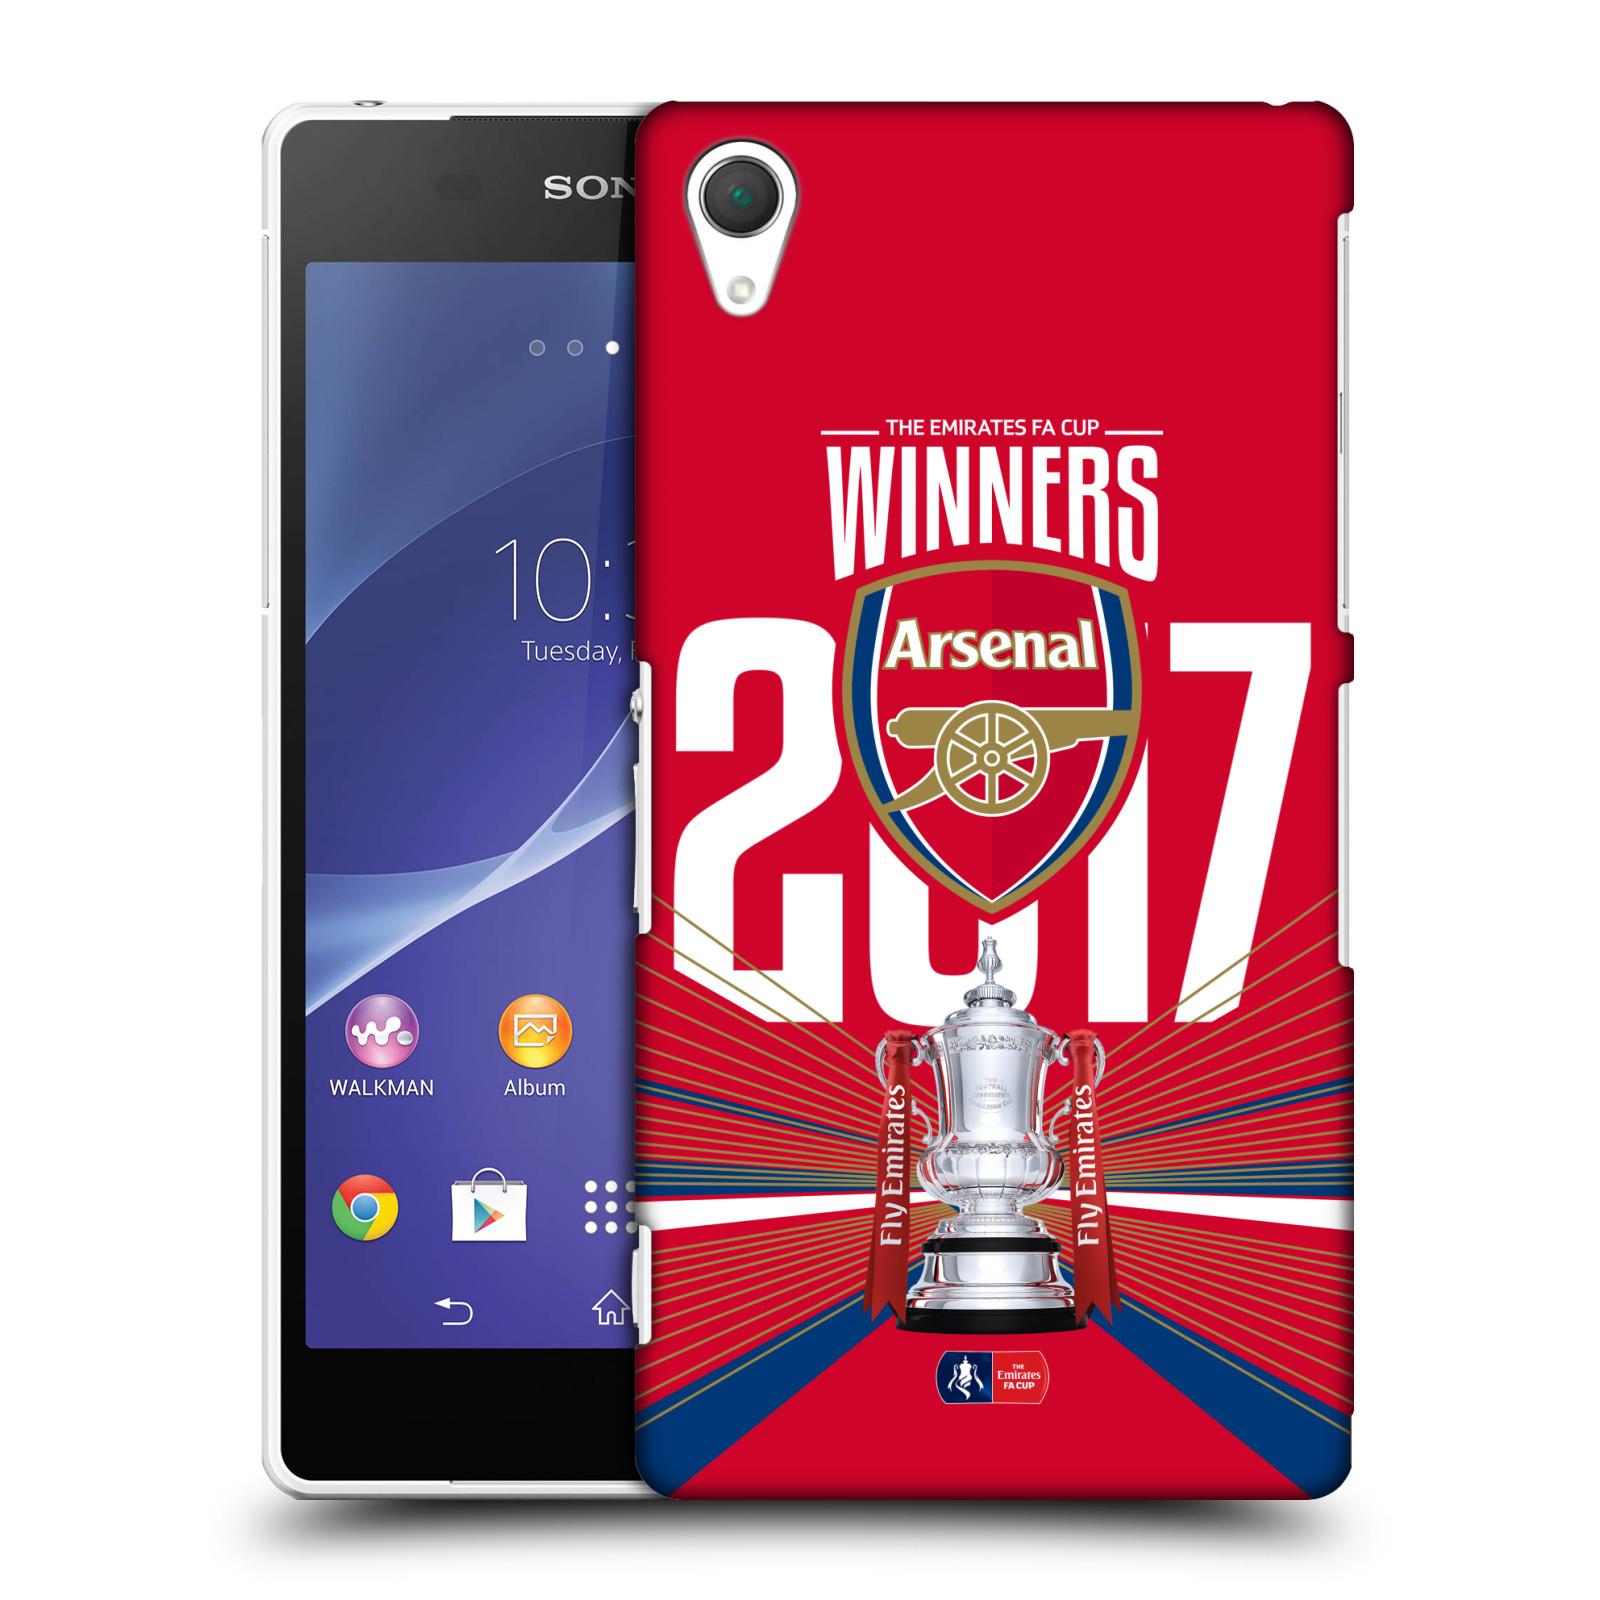 Plastové pouzdro na mobil Sony Xperia Z2 D6503 - Head Case - Arsenal FC - Trophy